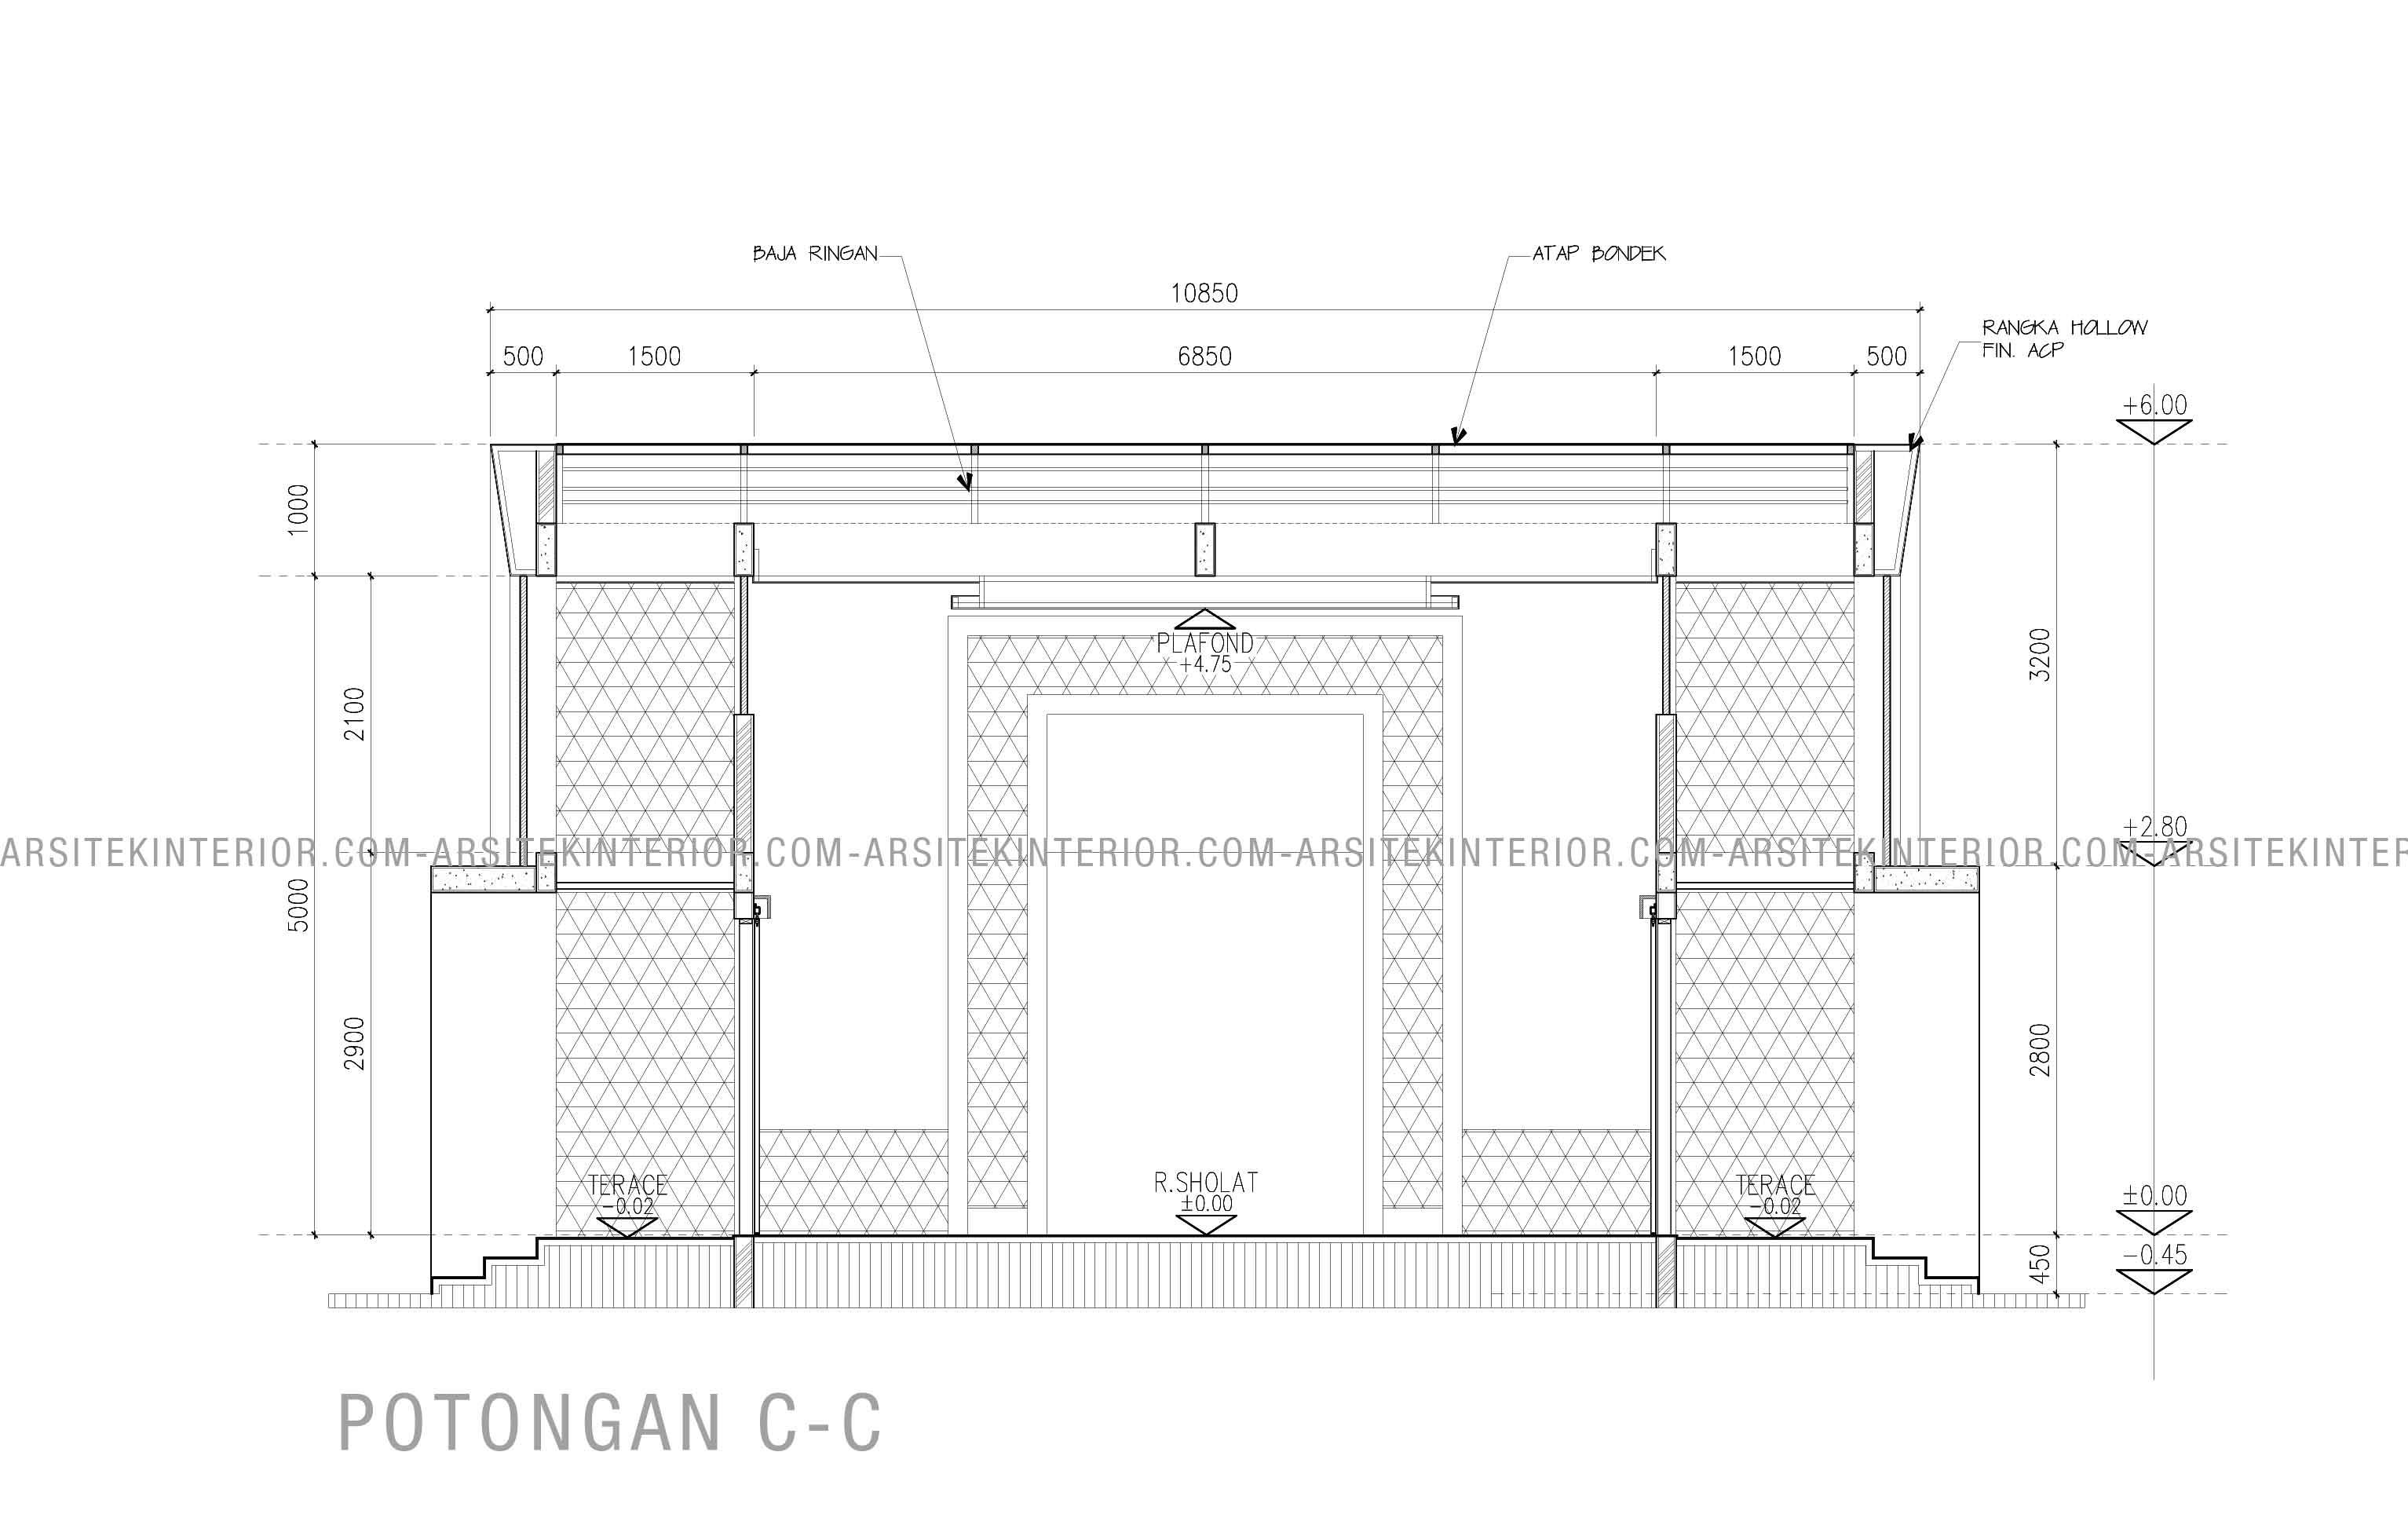 Jasa Desain Interior Mesjid Minimalis Ukuran Bangunan 10x10 Gratis